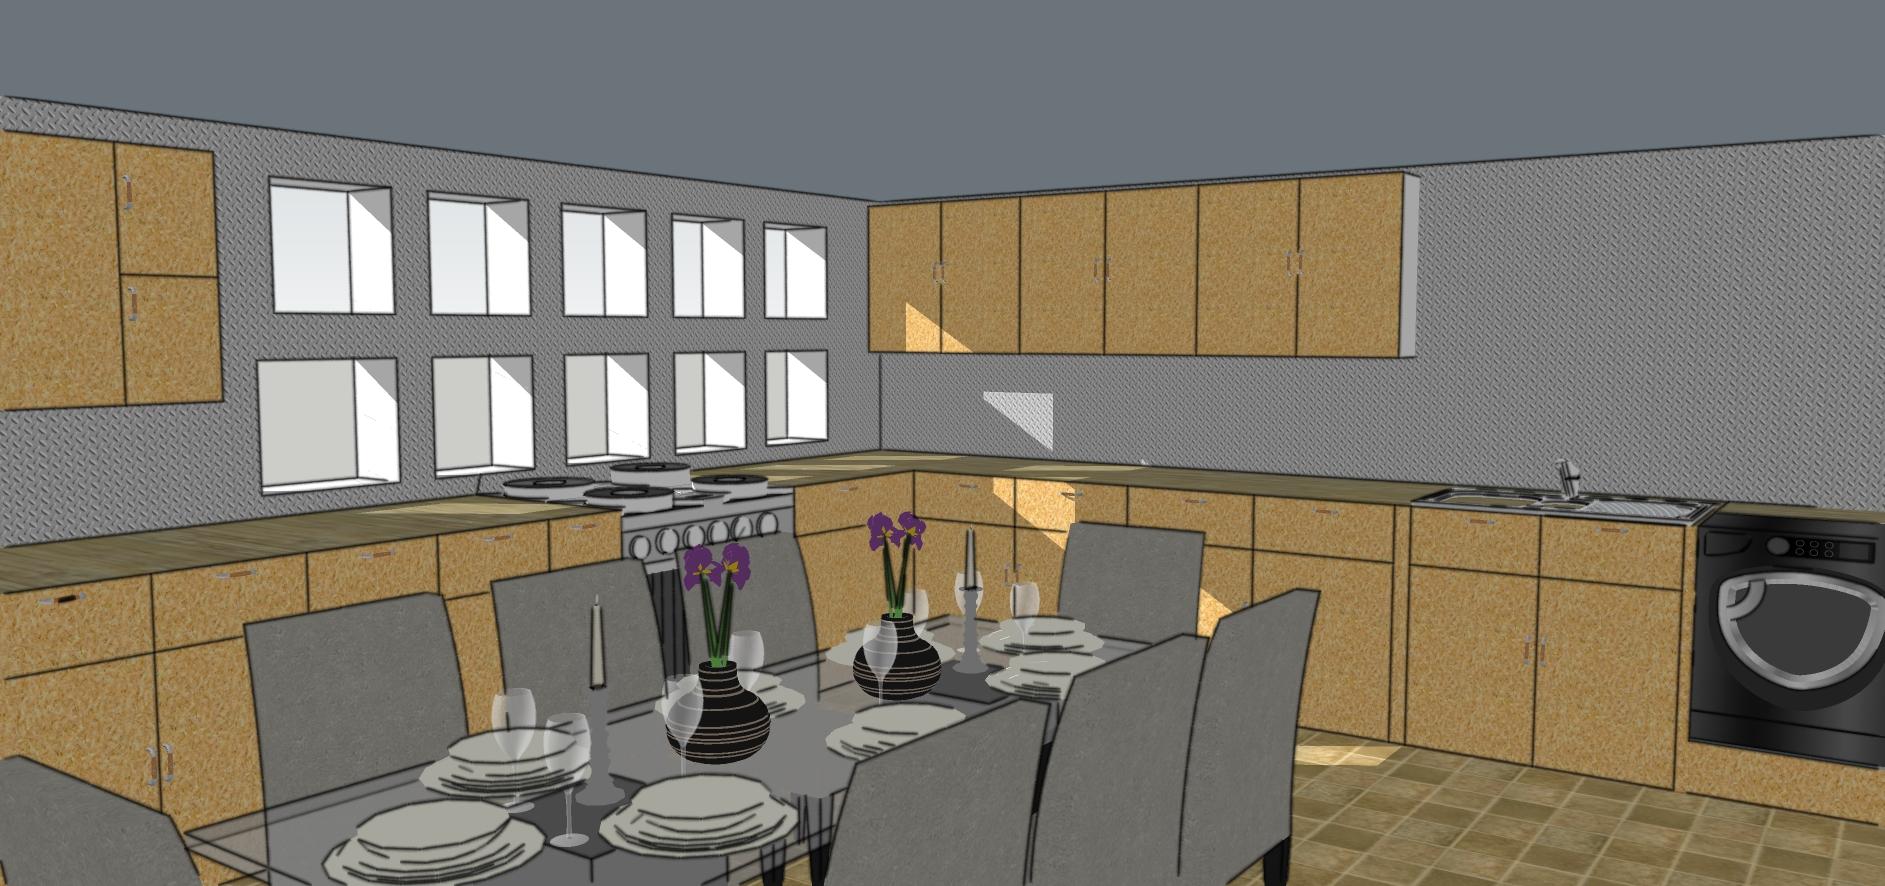 hamza house design3.jpg